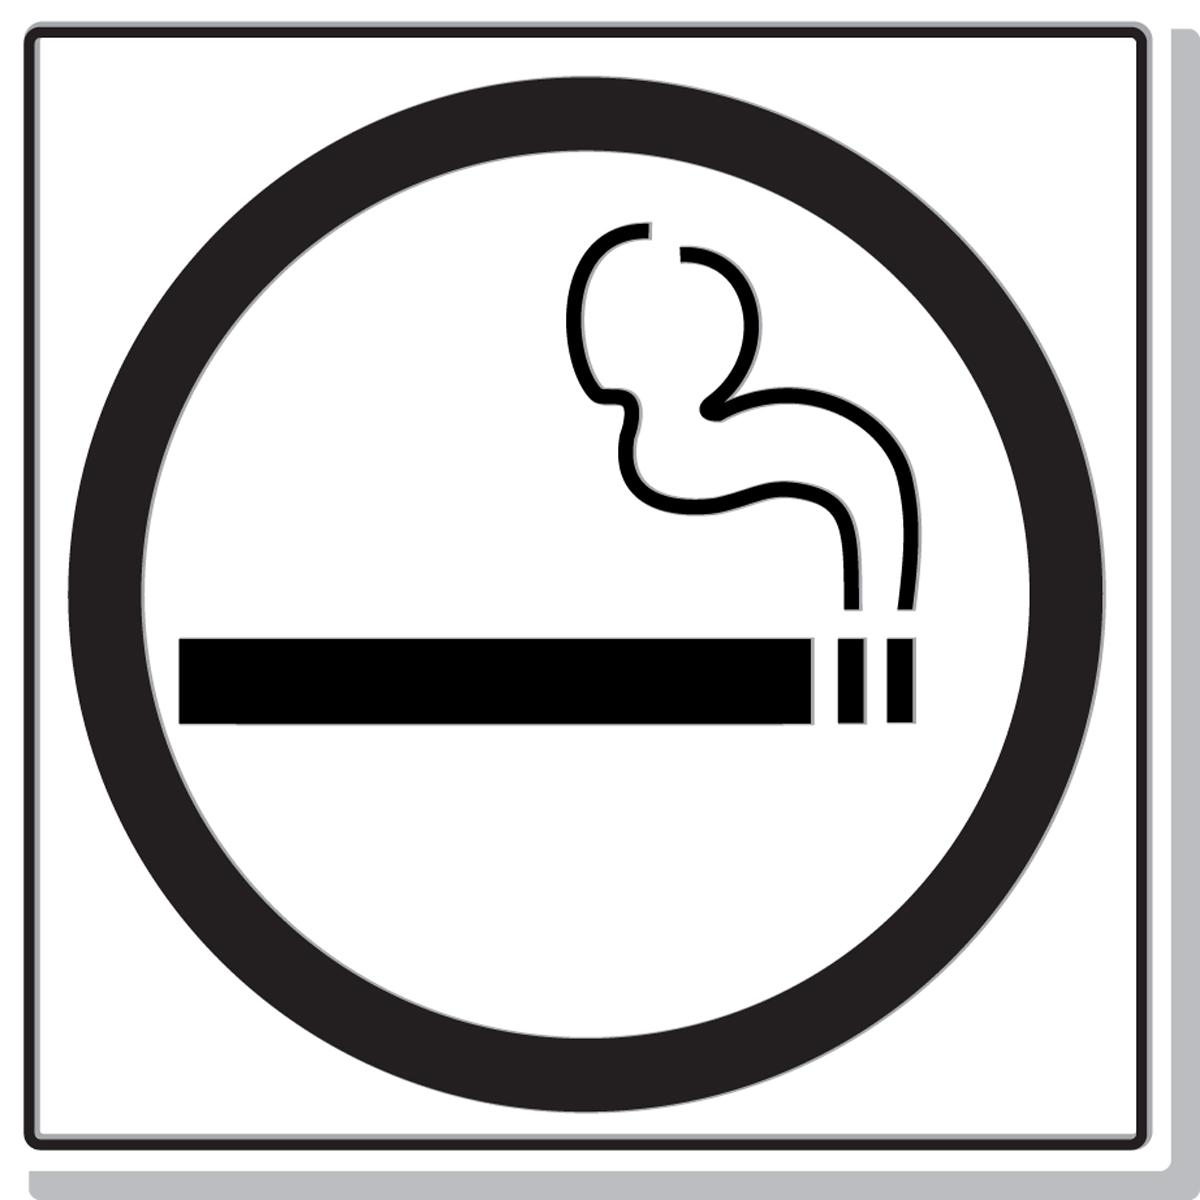 SMOKING PERMITTED SYMBOL